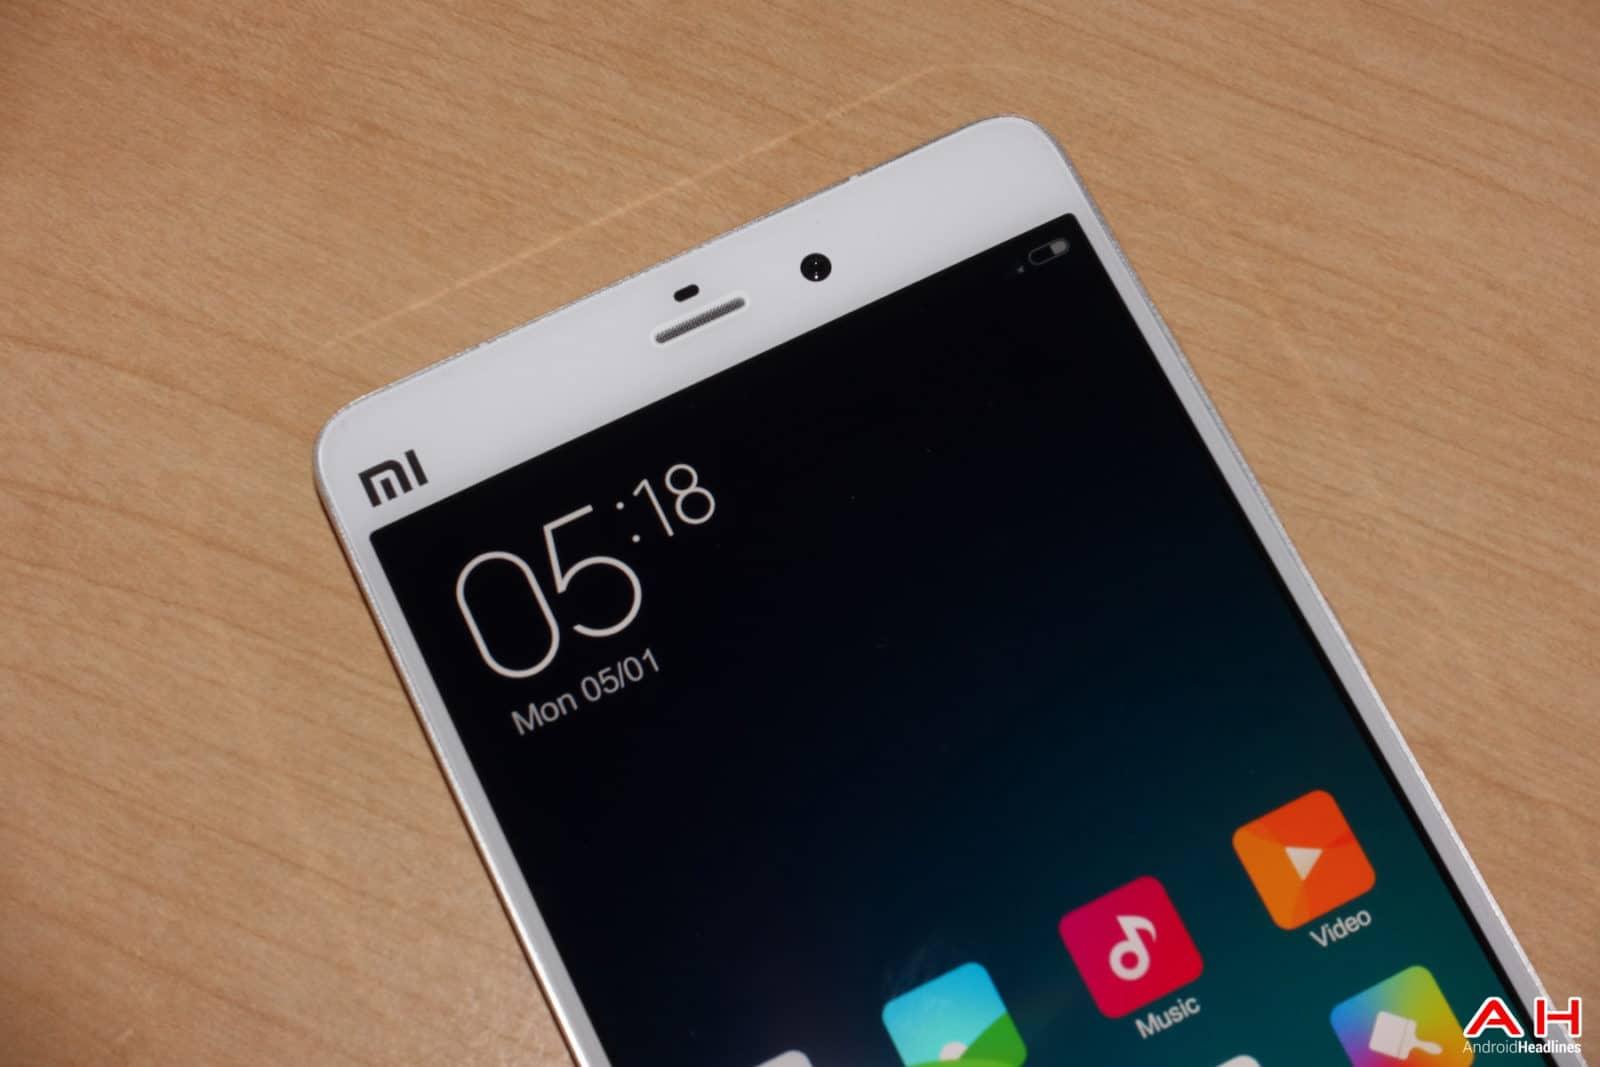 AH Xiaomi Note Bamboo Logo June 30 Series 2-5